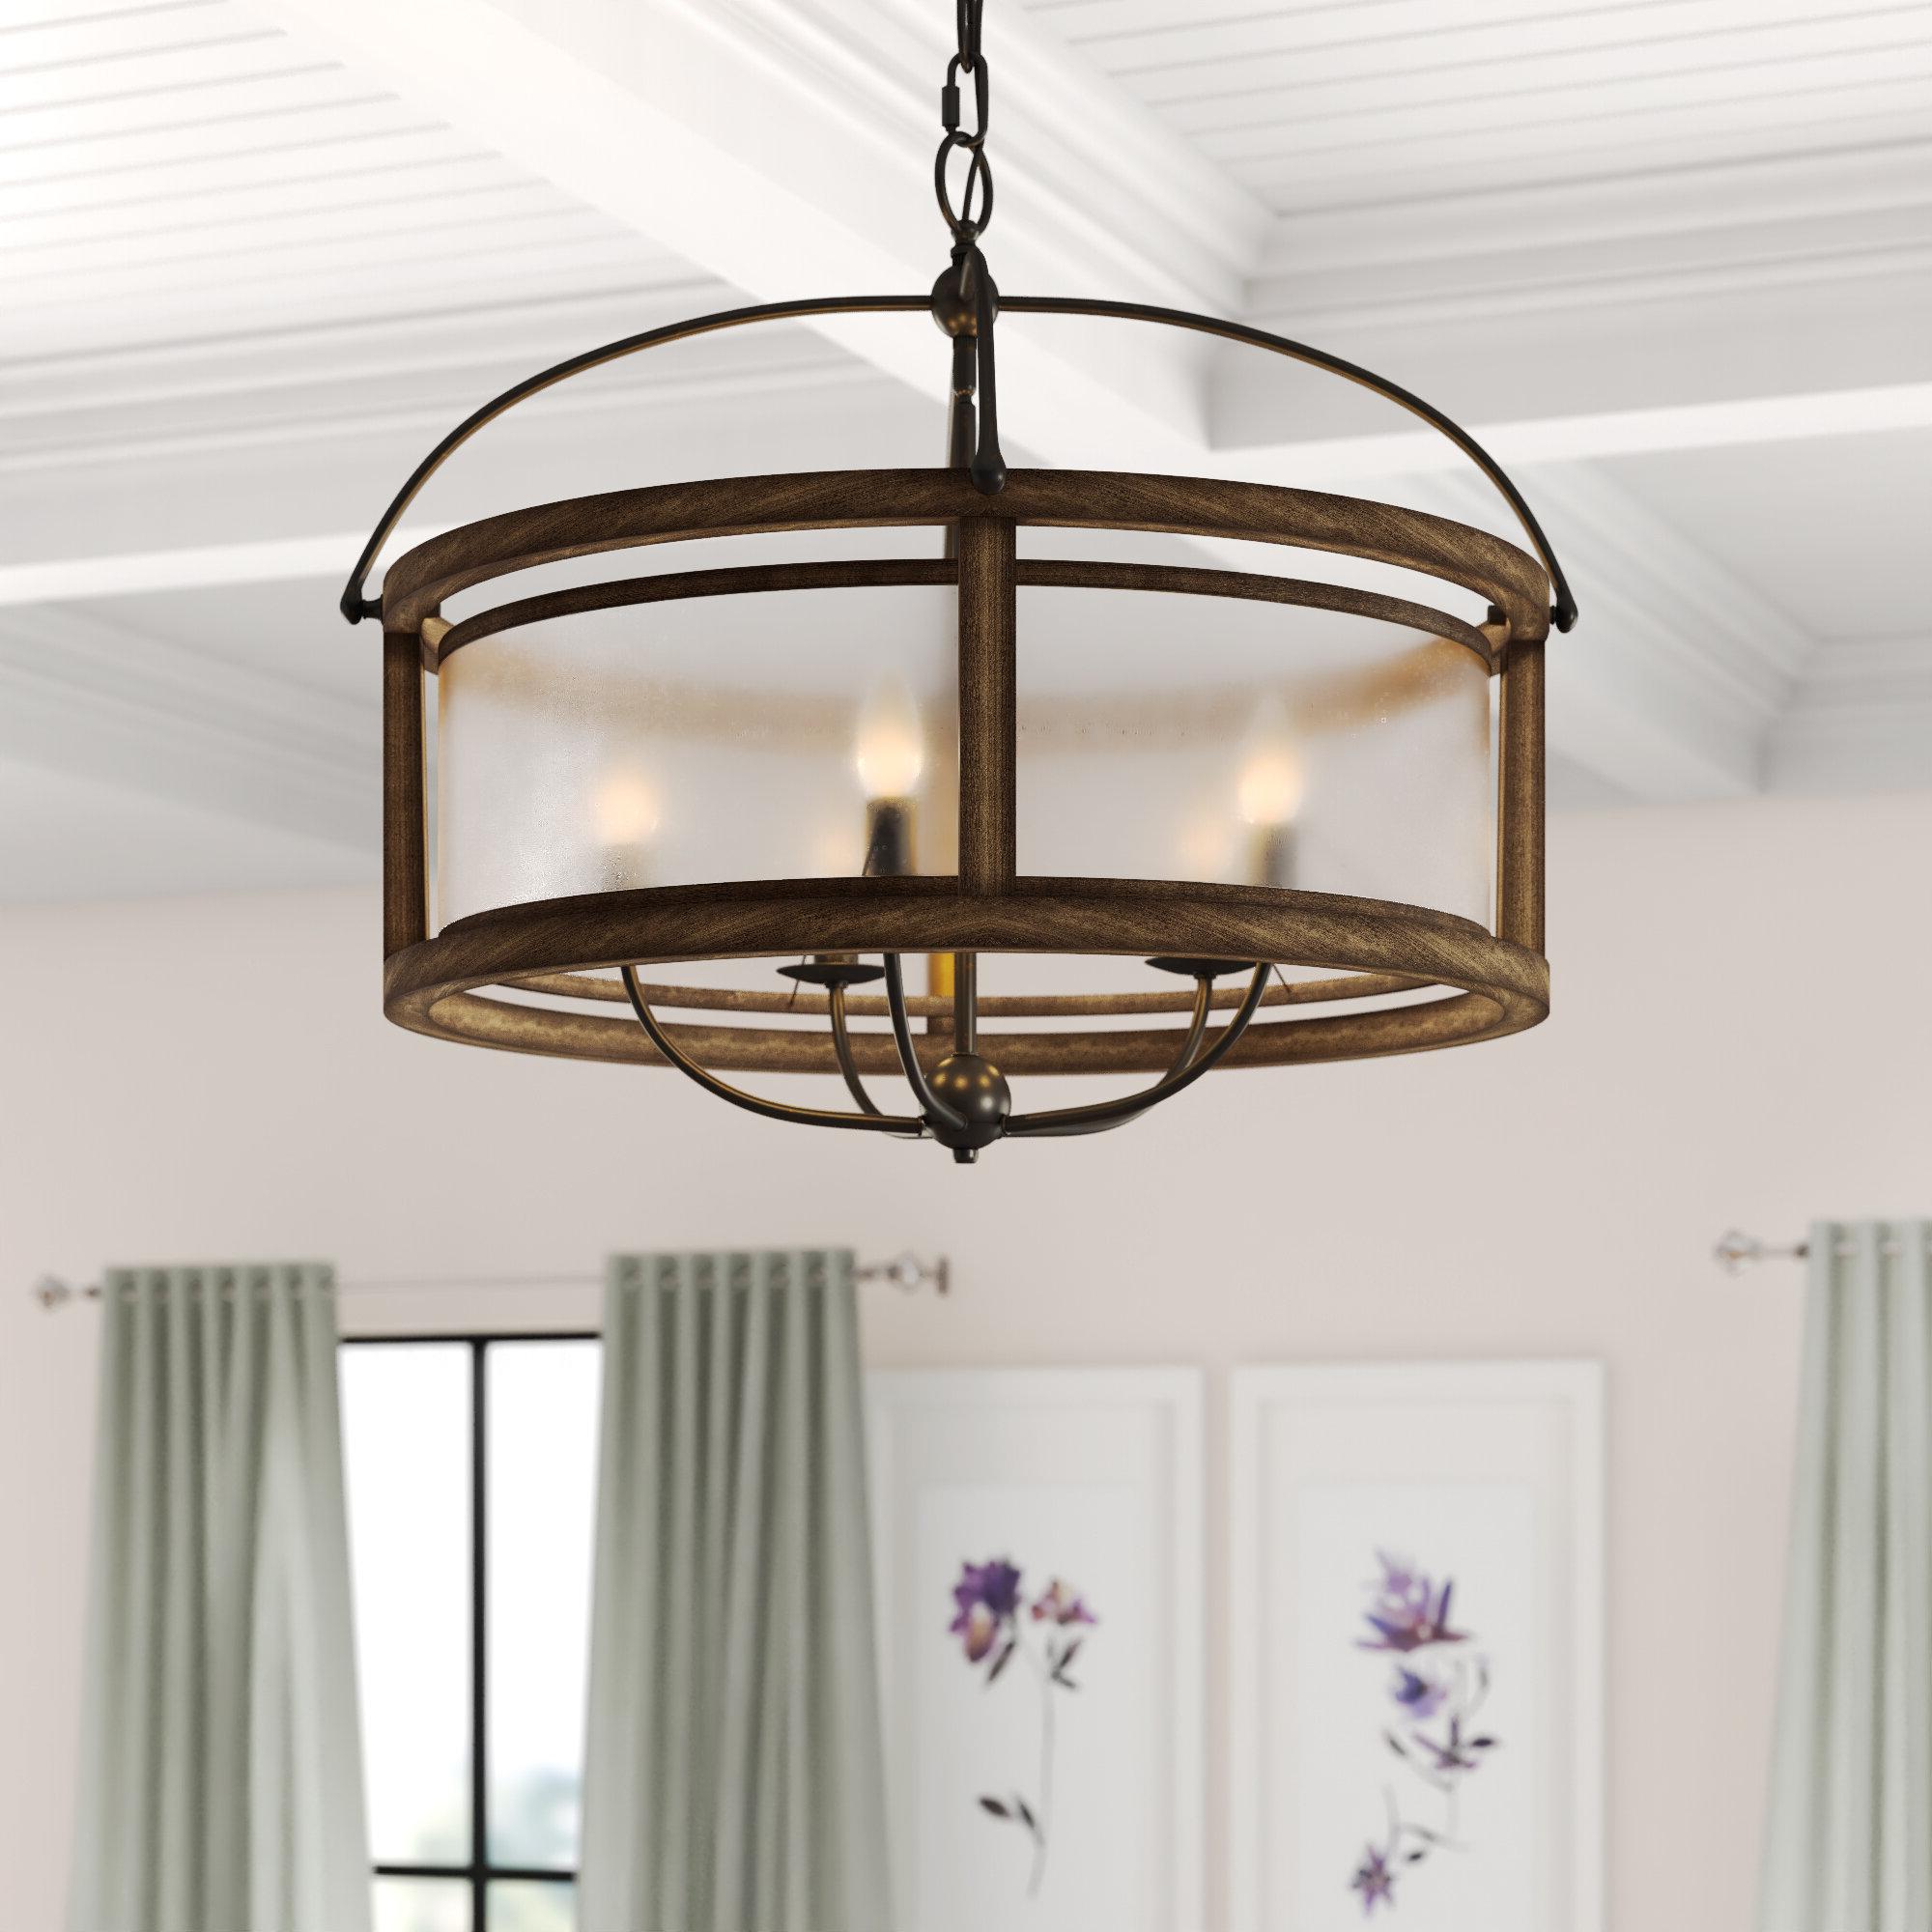 Reidar 4 Light Geometric Chandeliers Pertaining To Fashionable Aadhya 5 Light Drum Chandelier (View 16 of 25)